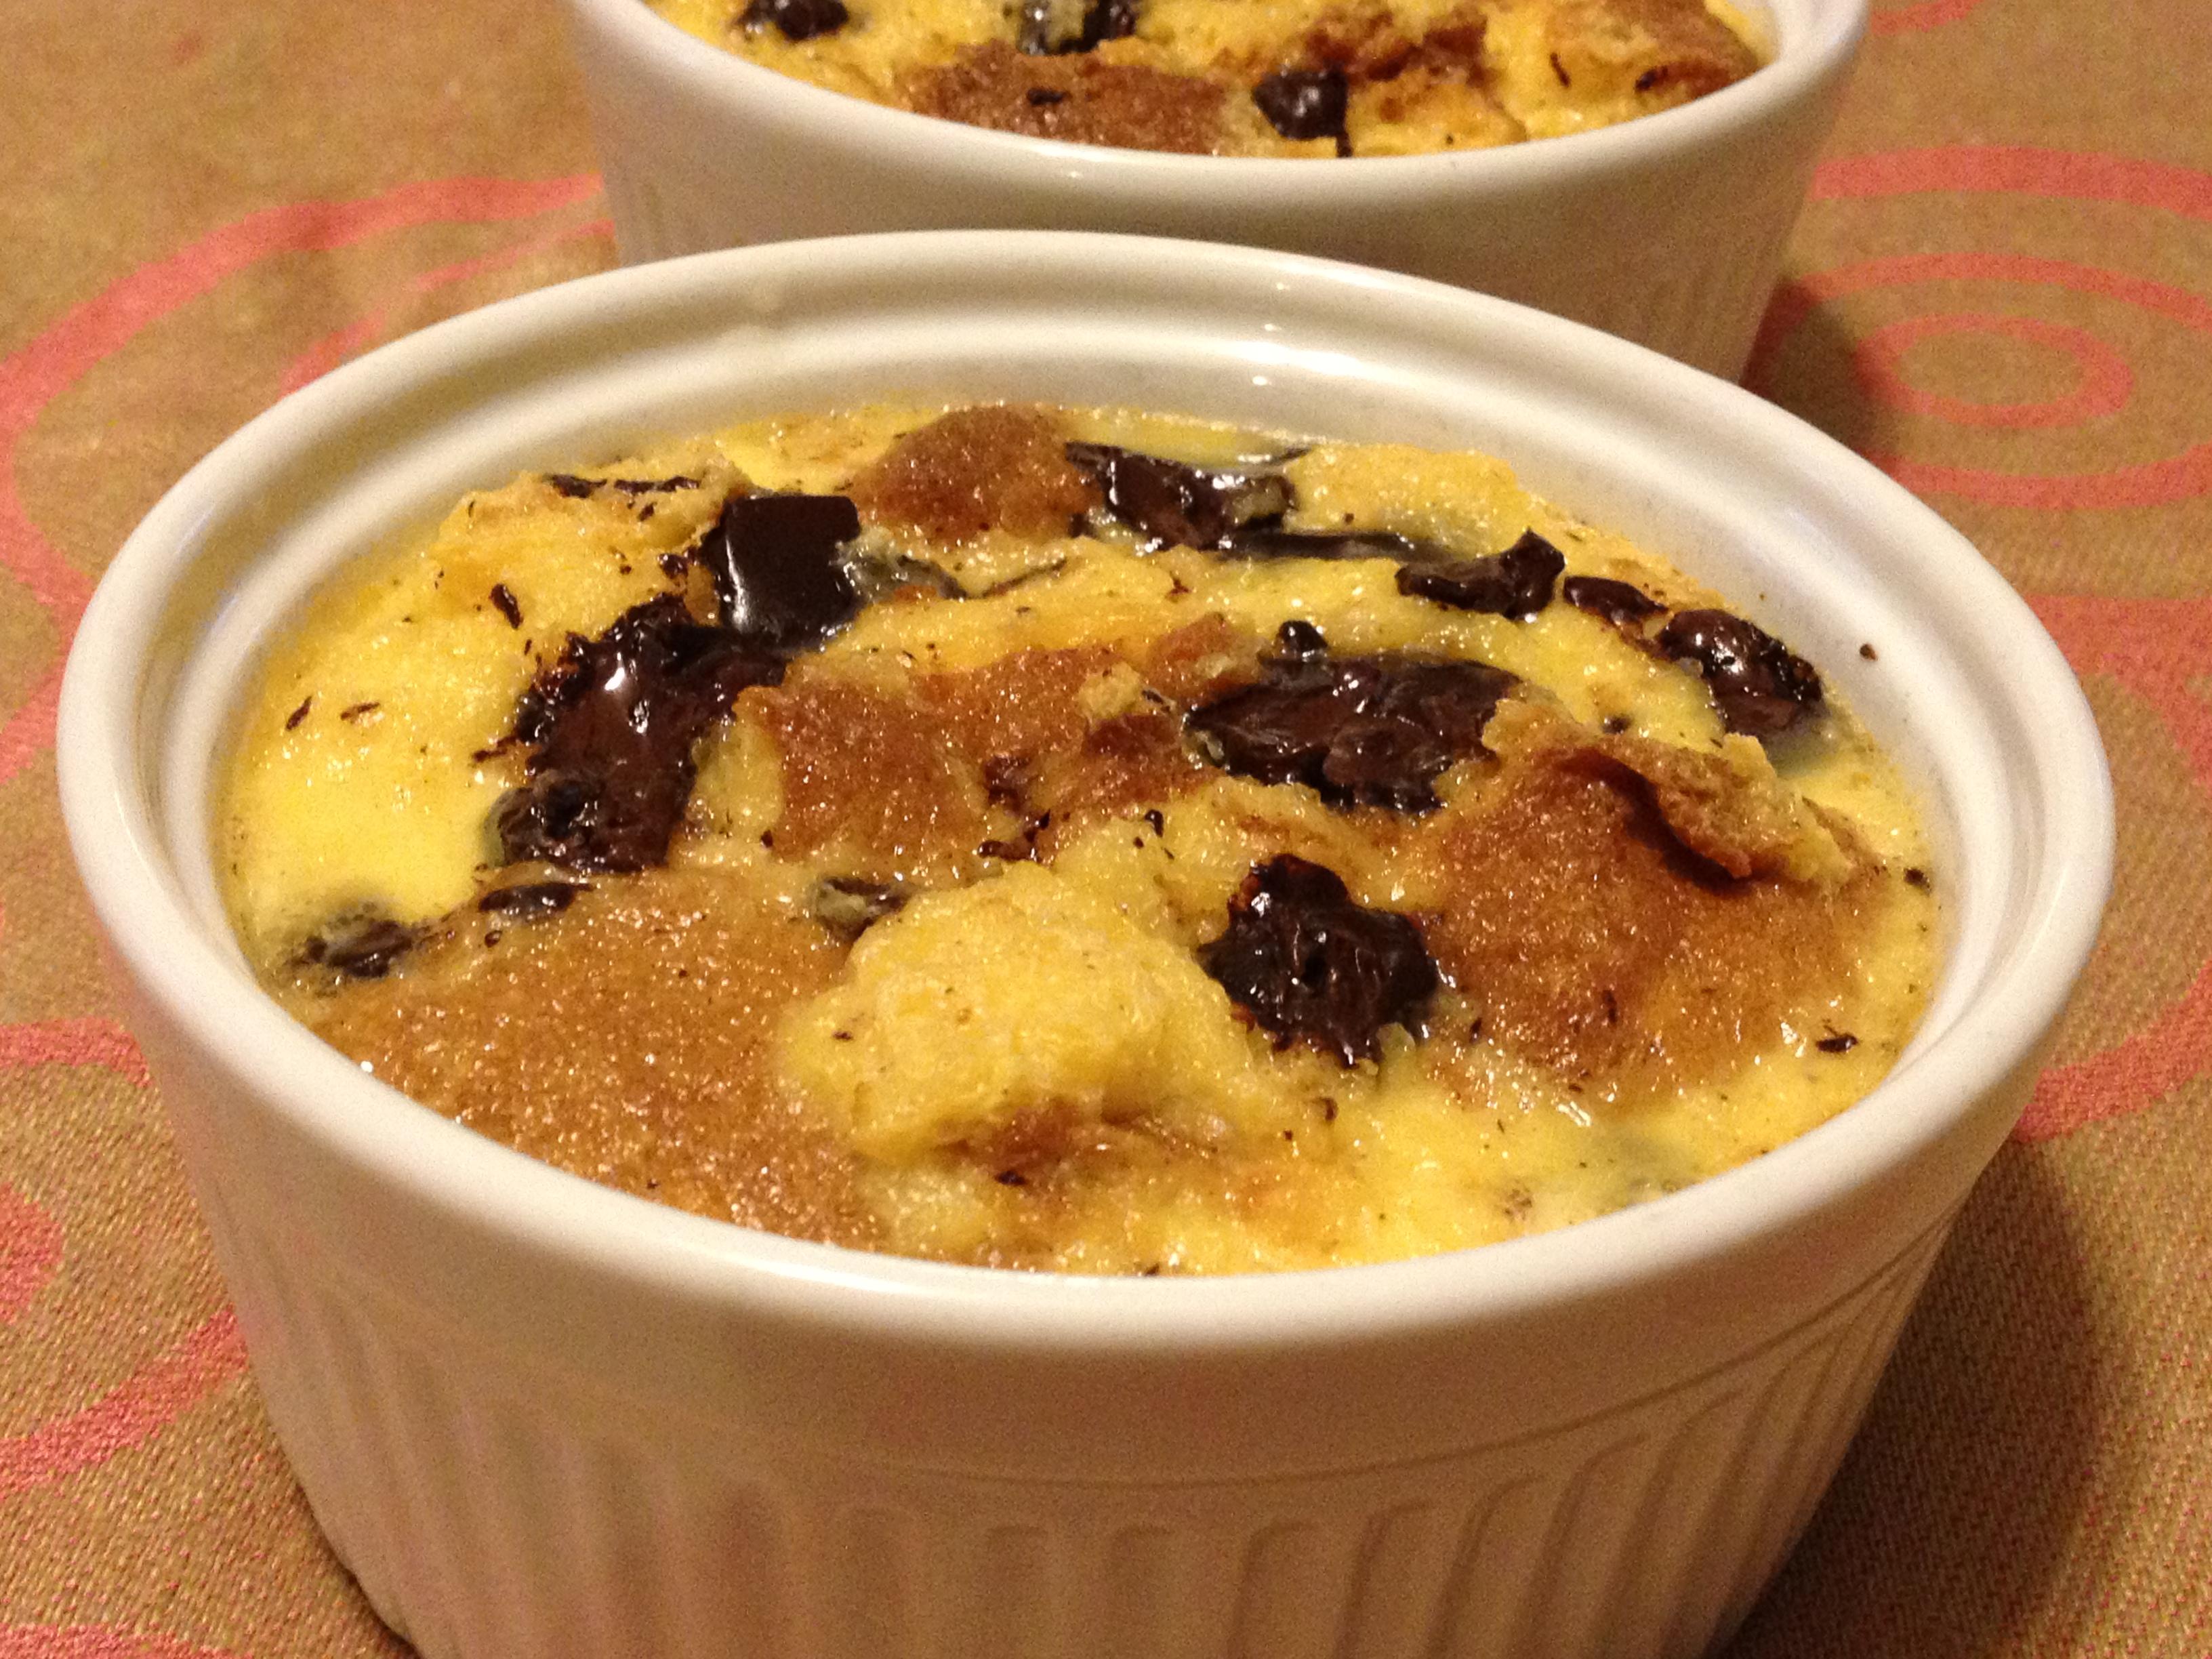 Pandoro Bread Pudding with Chocolate and Orange